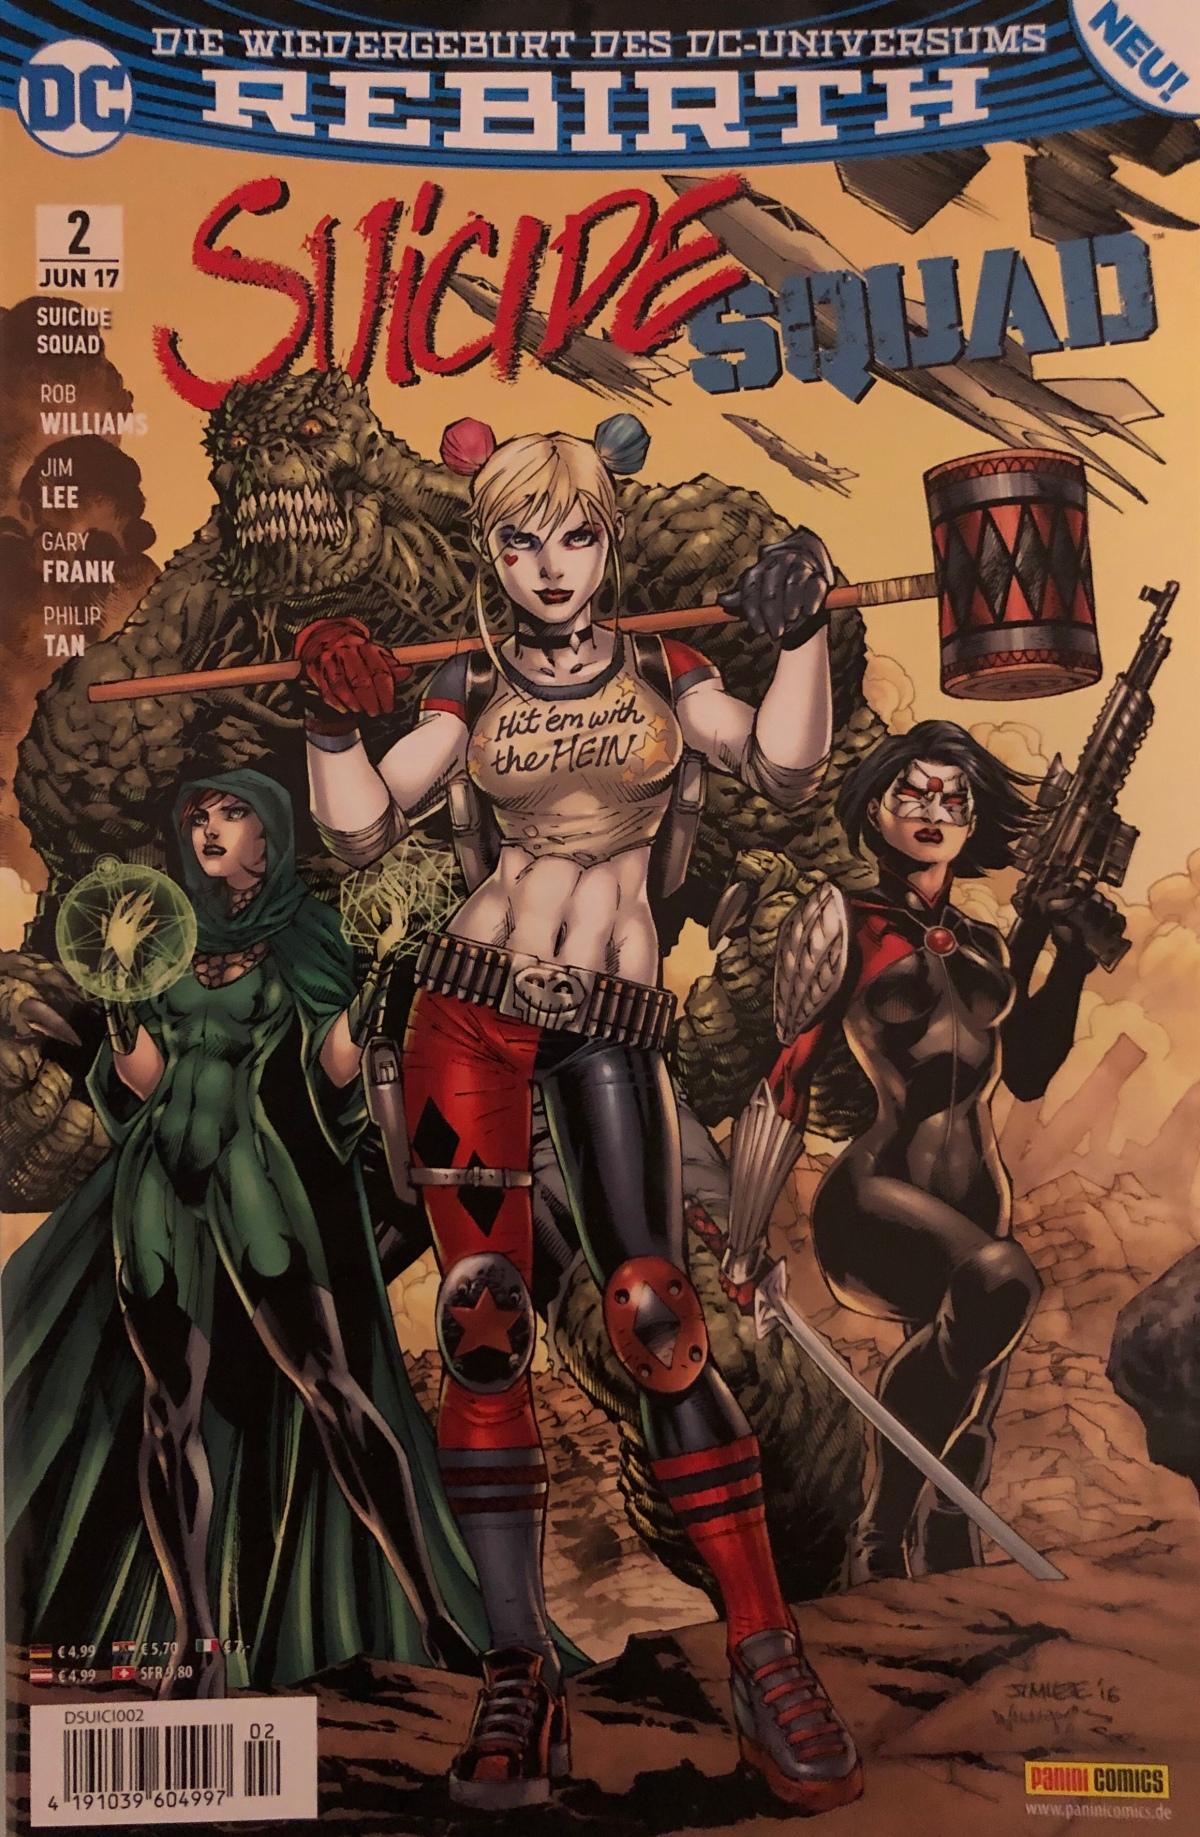 Suicide Squad #3 & #4 (DC Rebirth)|Review